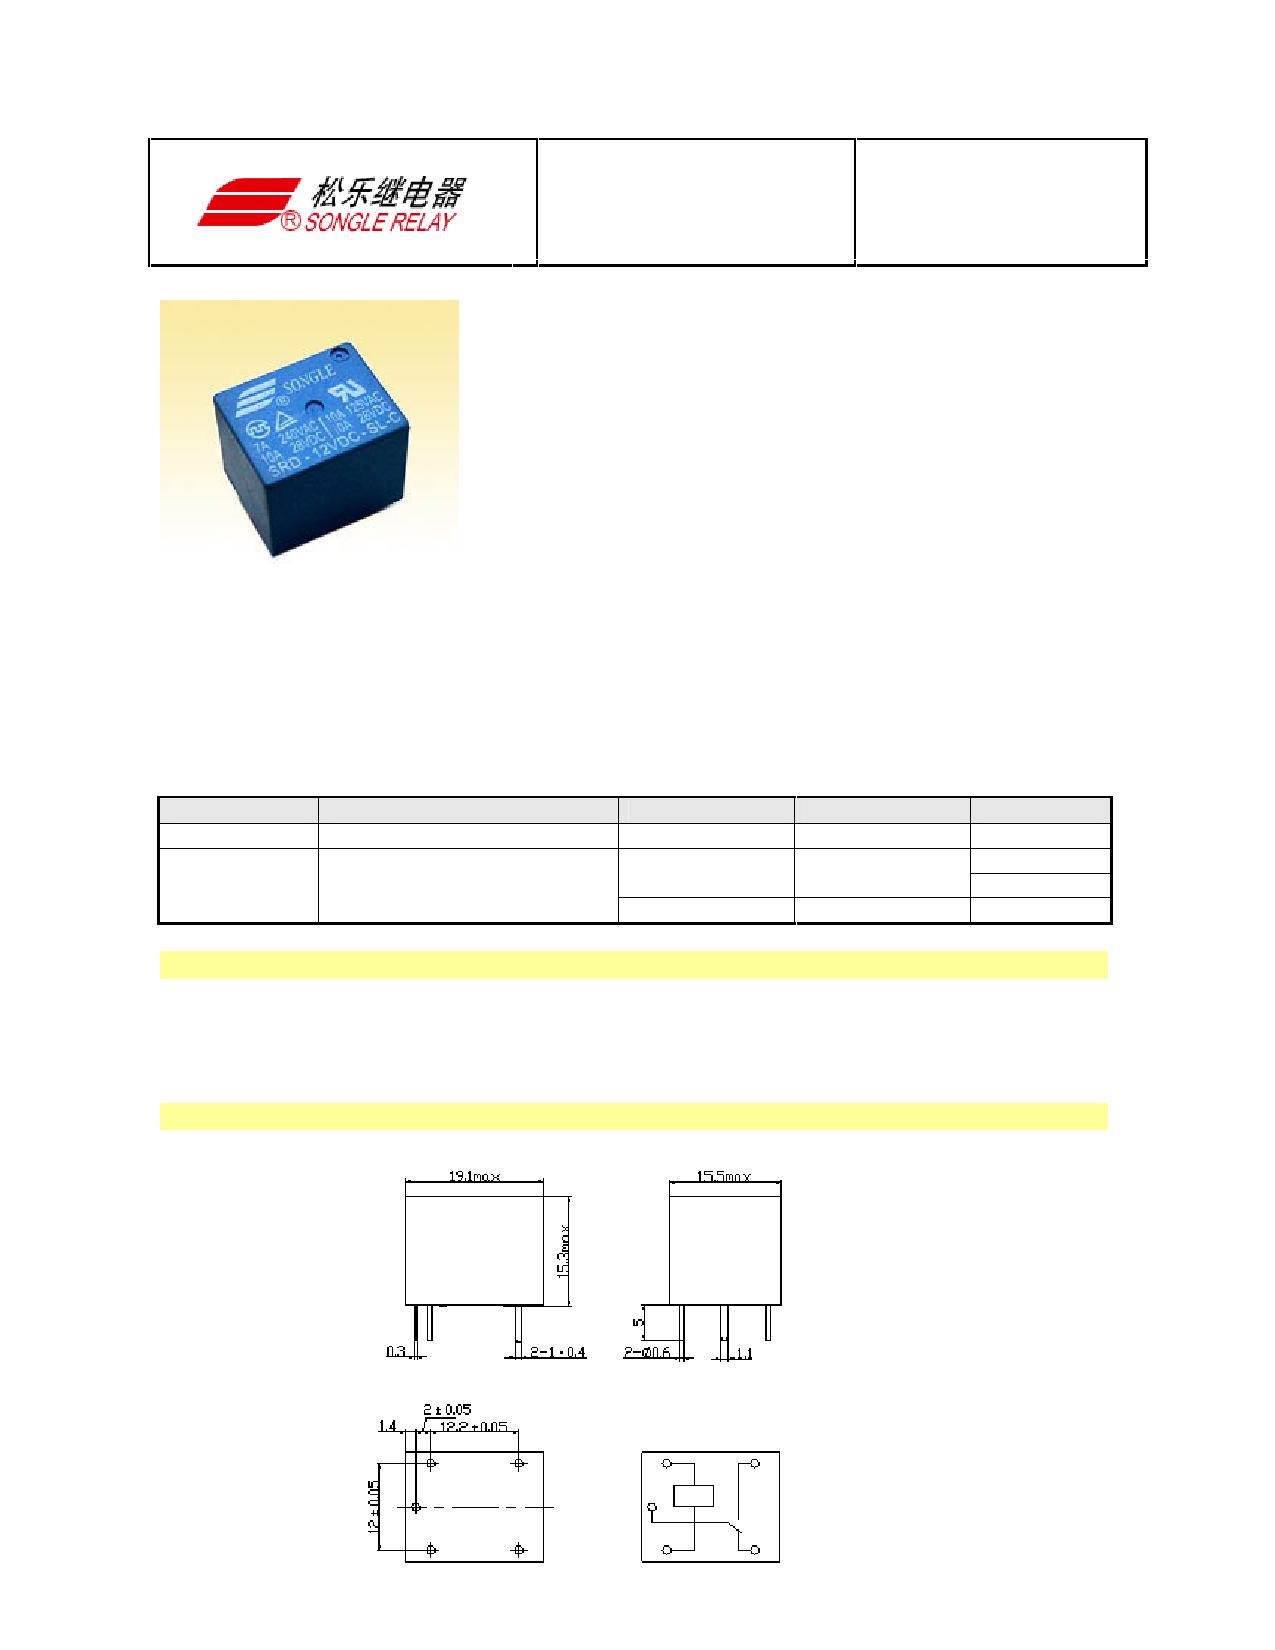 SRD-03VDC-SL-C image